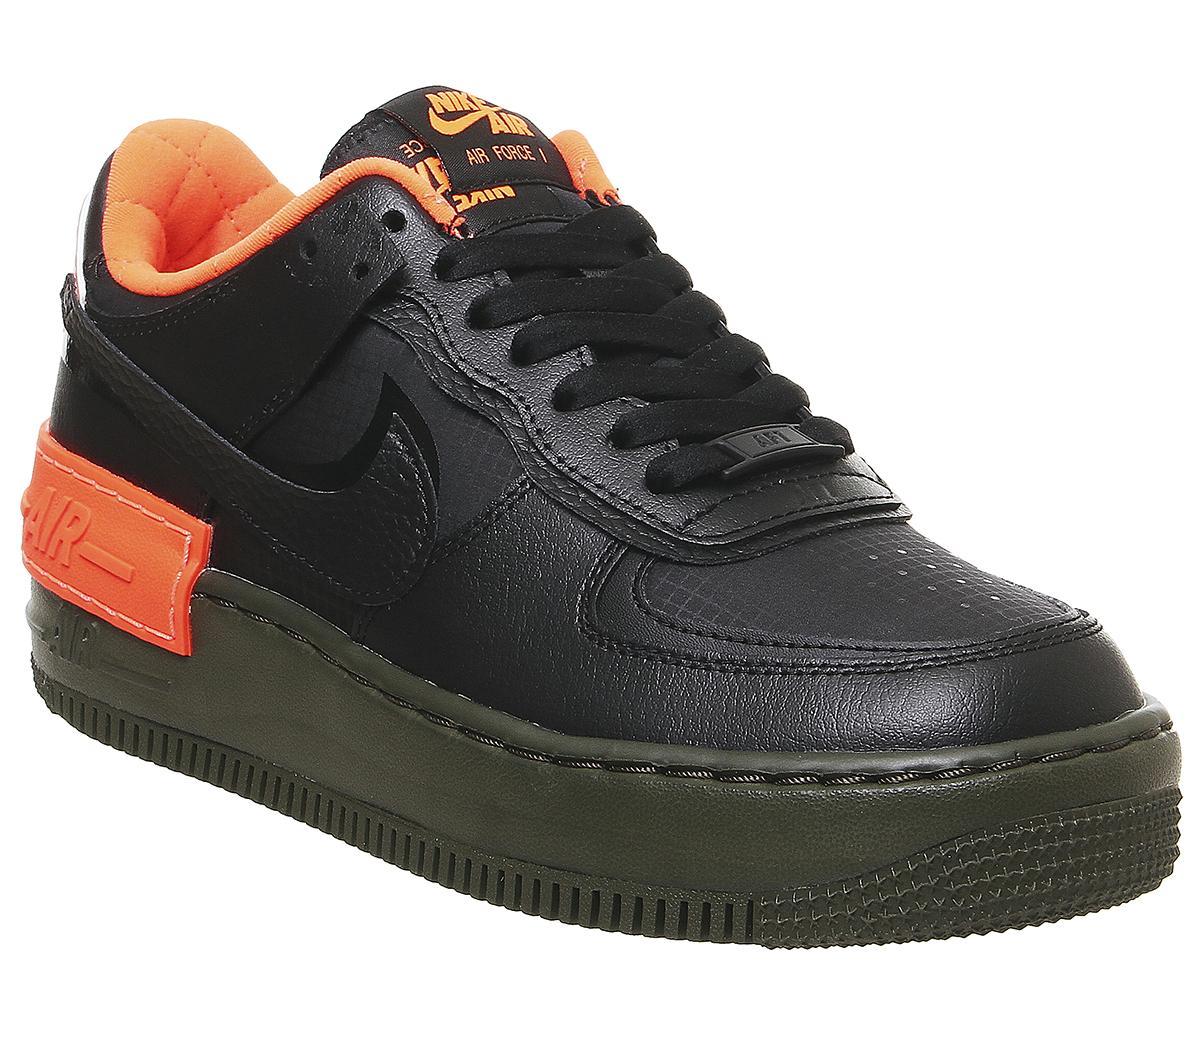 Nike Air Force 1 Shadow Trainers Black